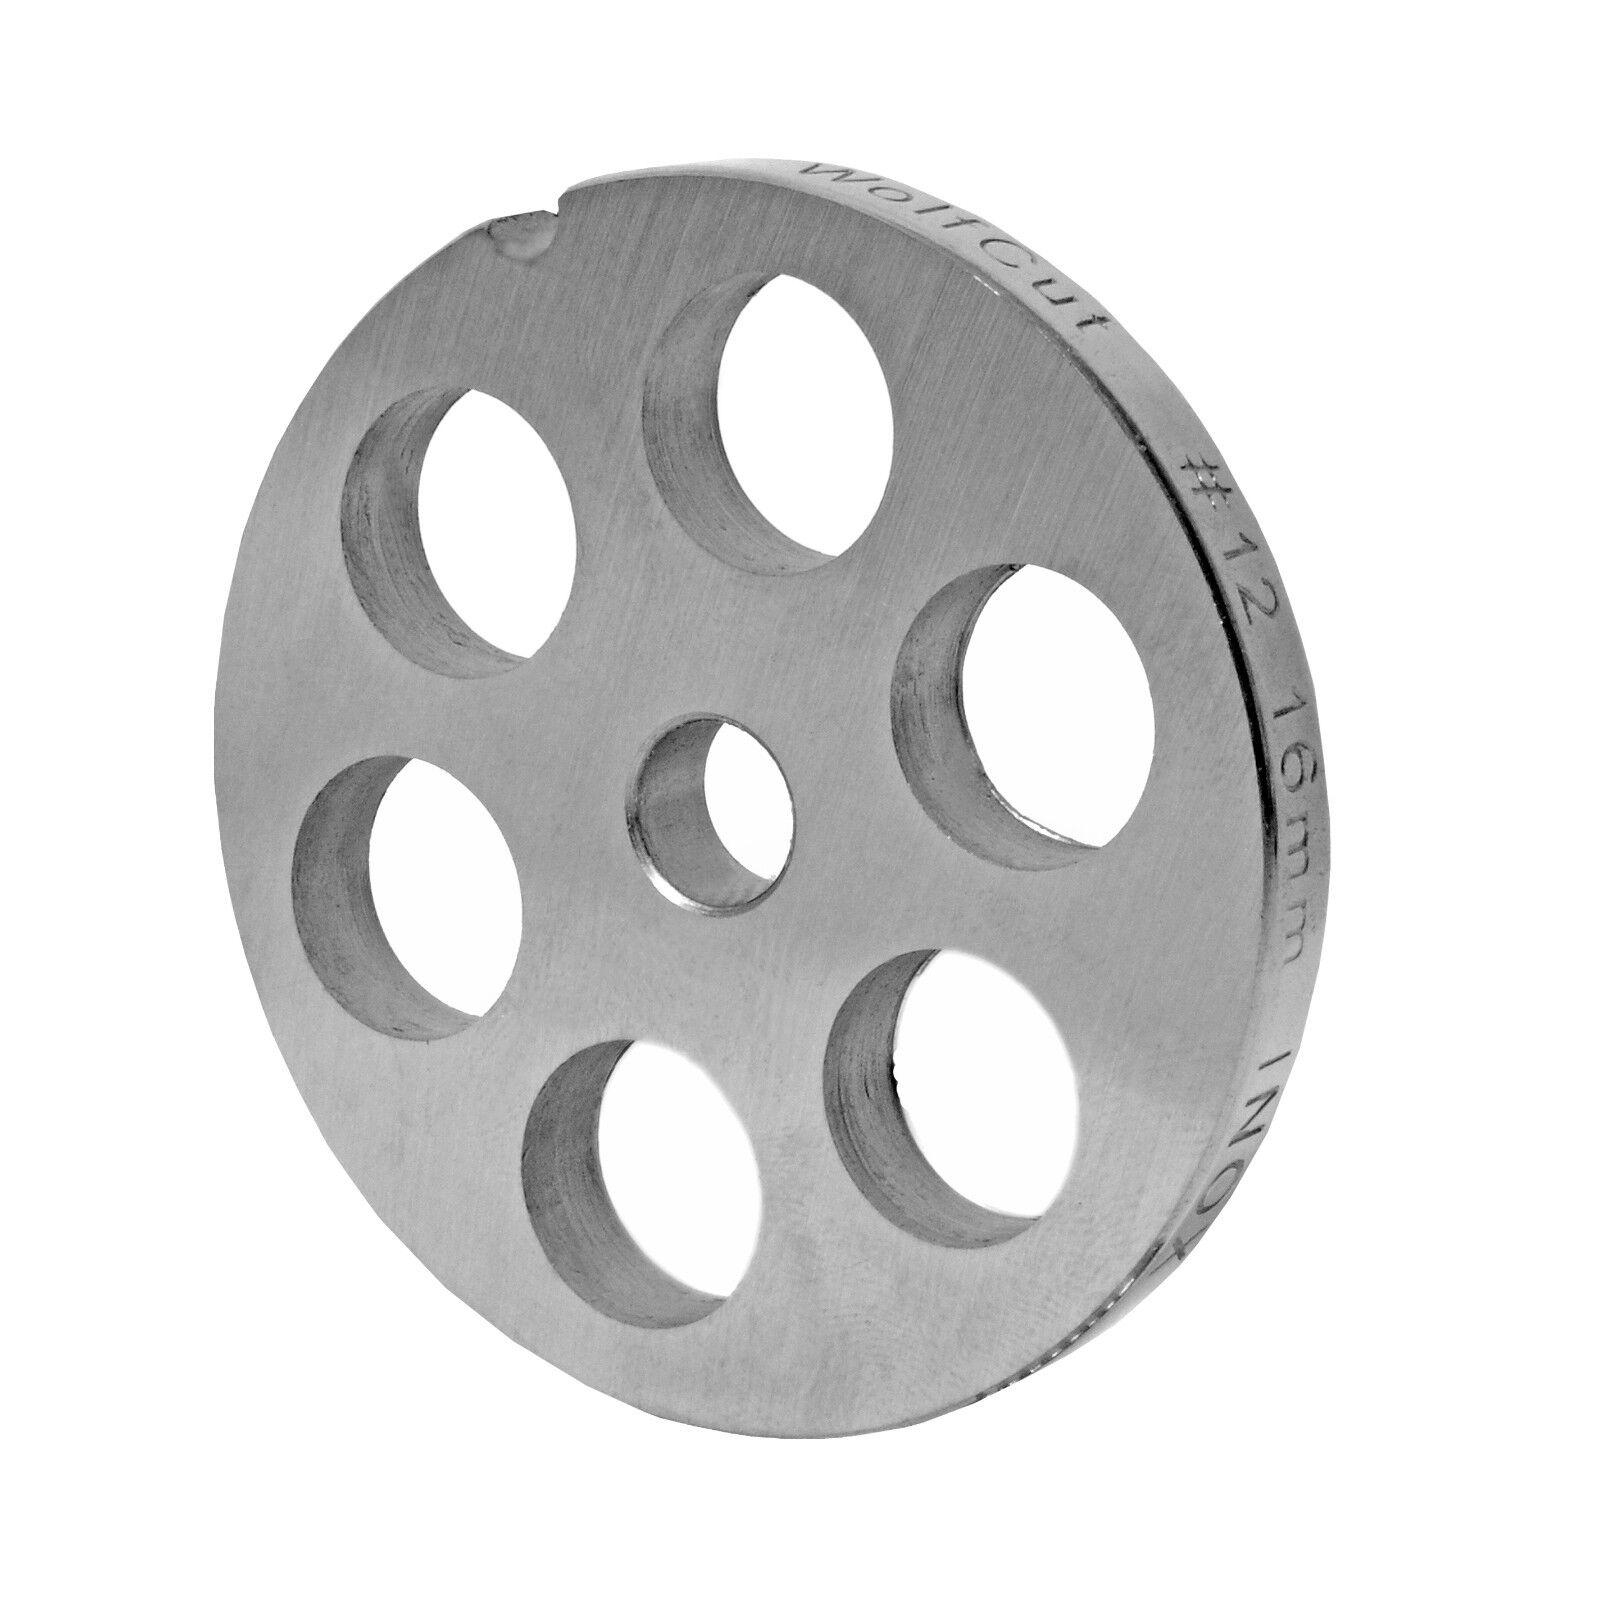 Reber Reber Reber Tipo N.12el 9501 N Disco Forato per Tritacarne Taglia 10 12 0a015d